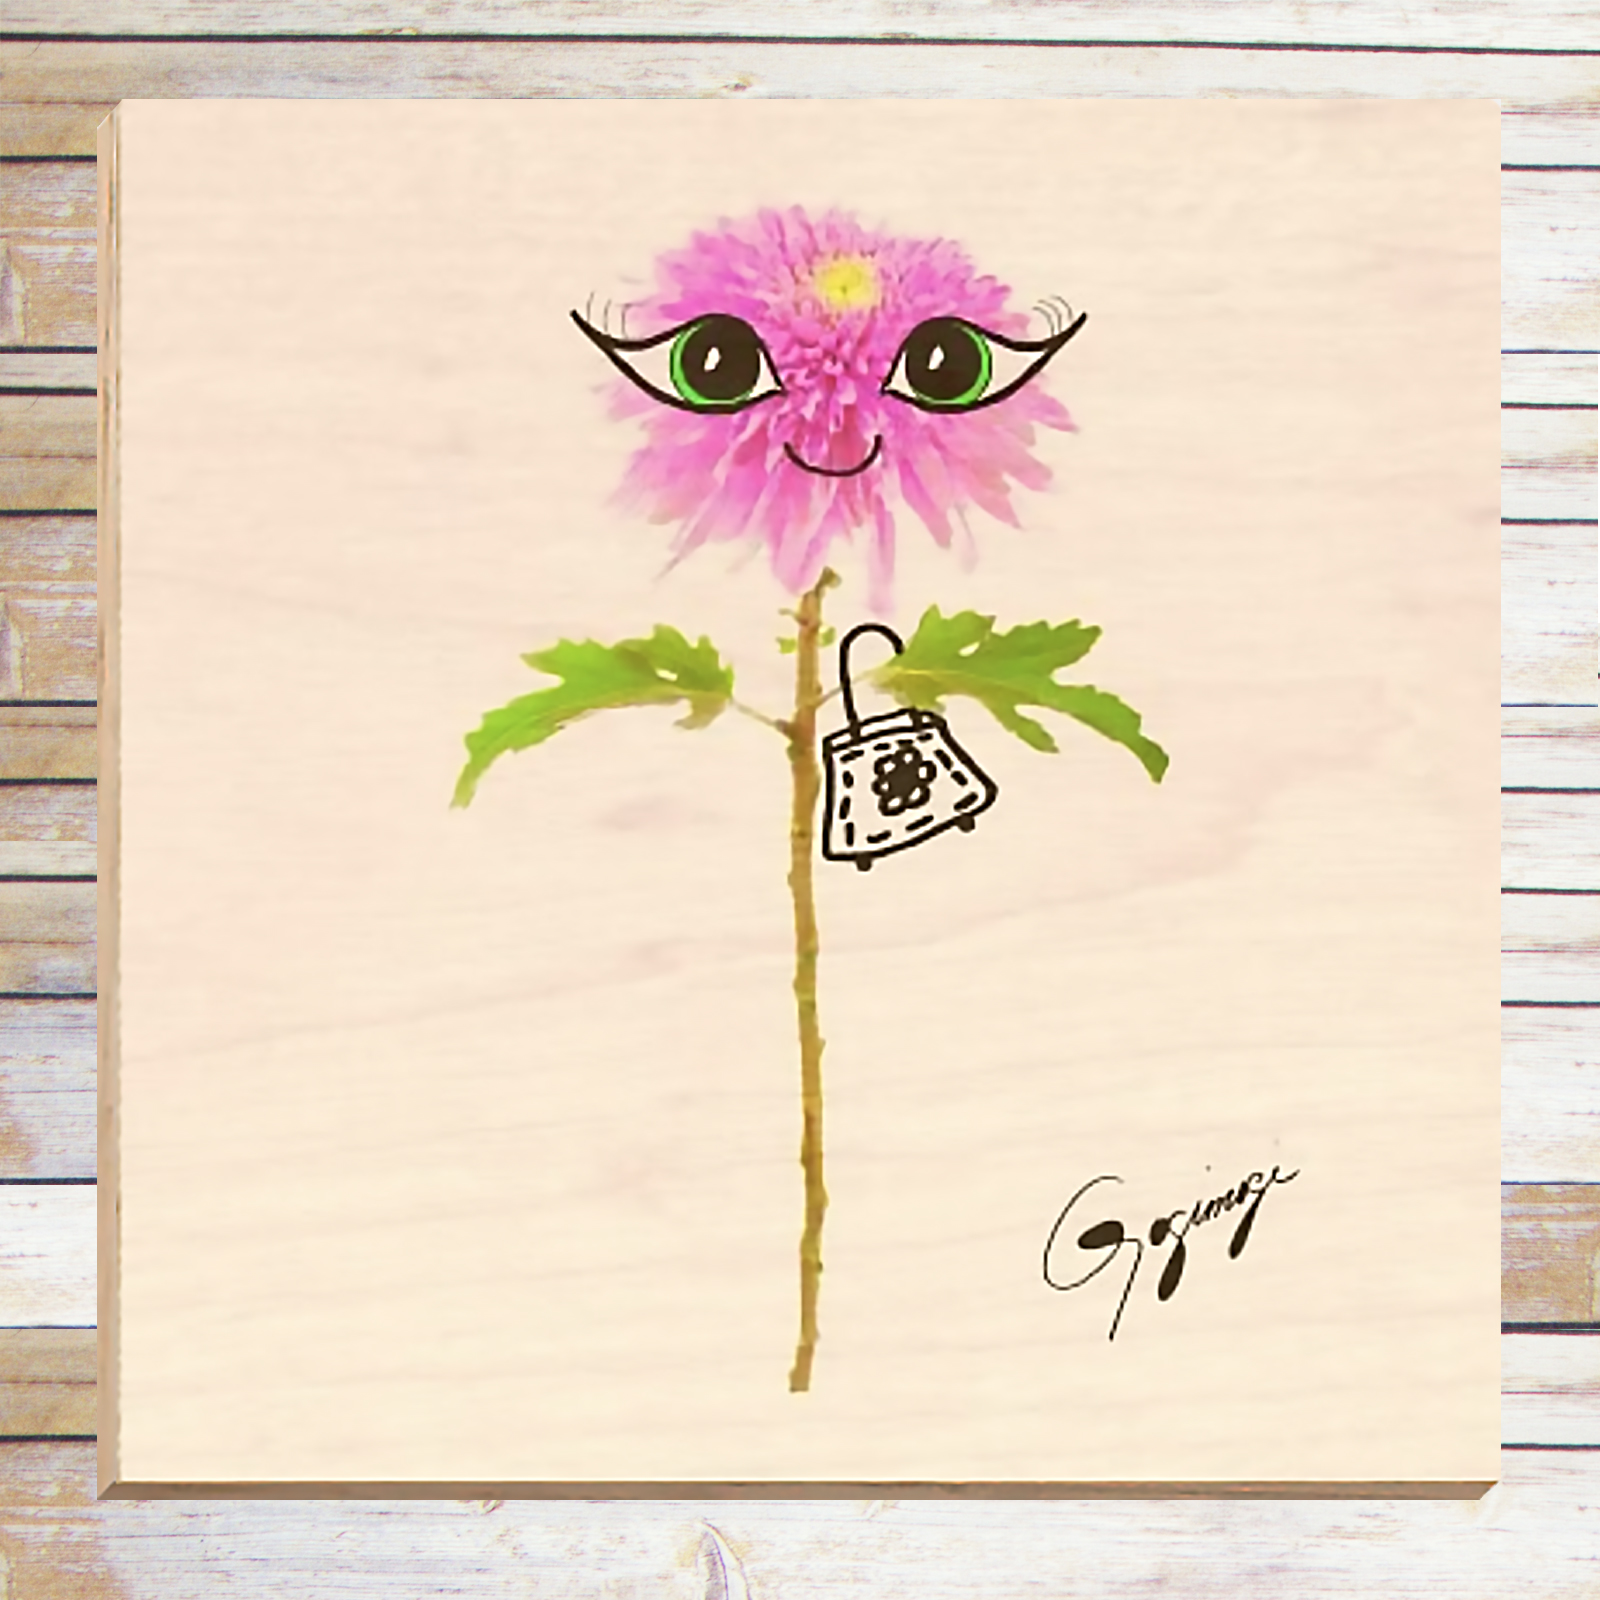 Flower Wall Art dahlia flower wall art on wood – gogimogi